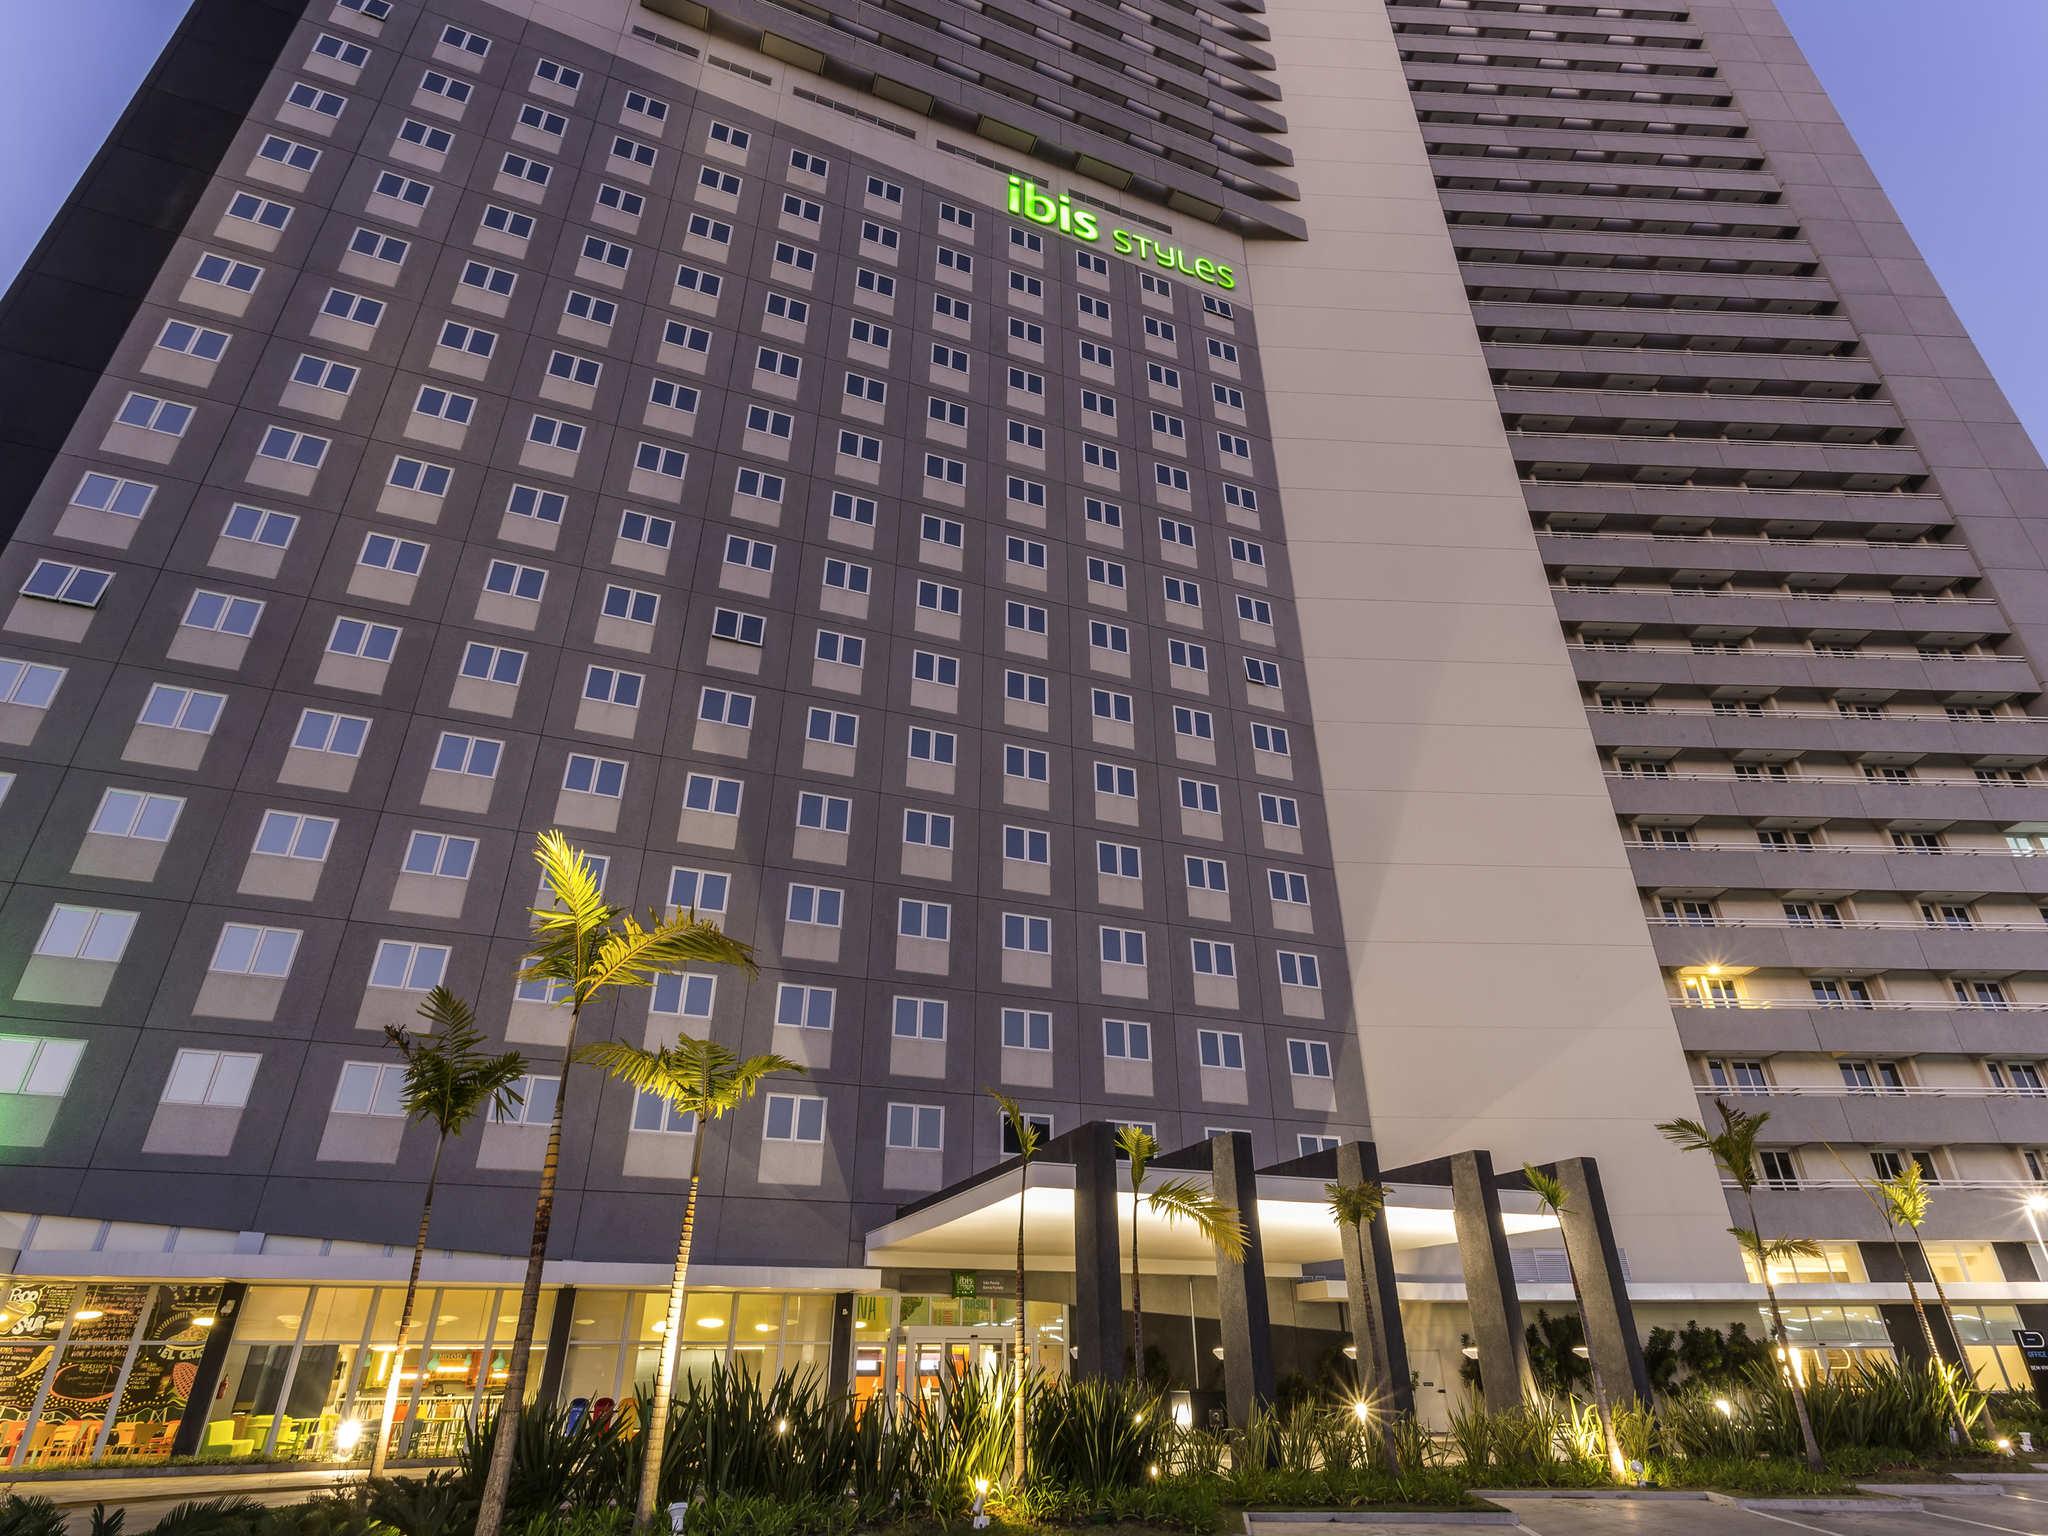 Hotell – ibis Styles São Paulo Barra Funda